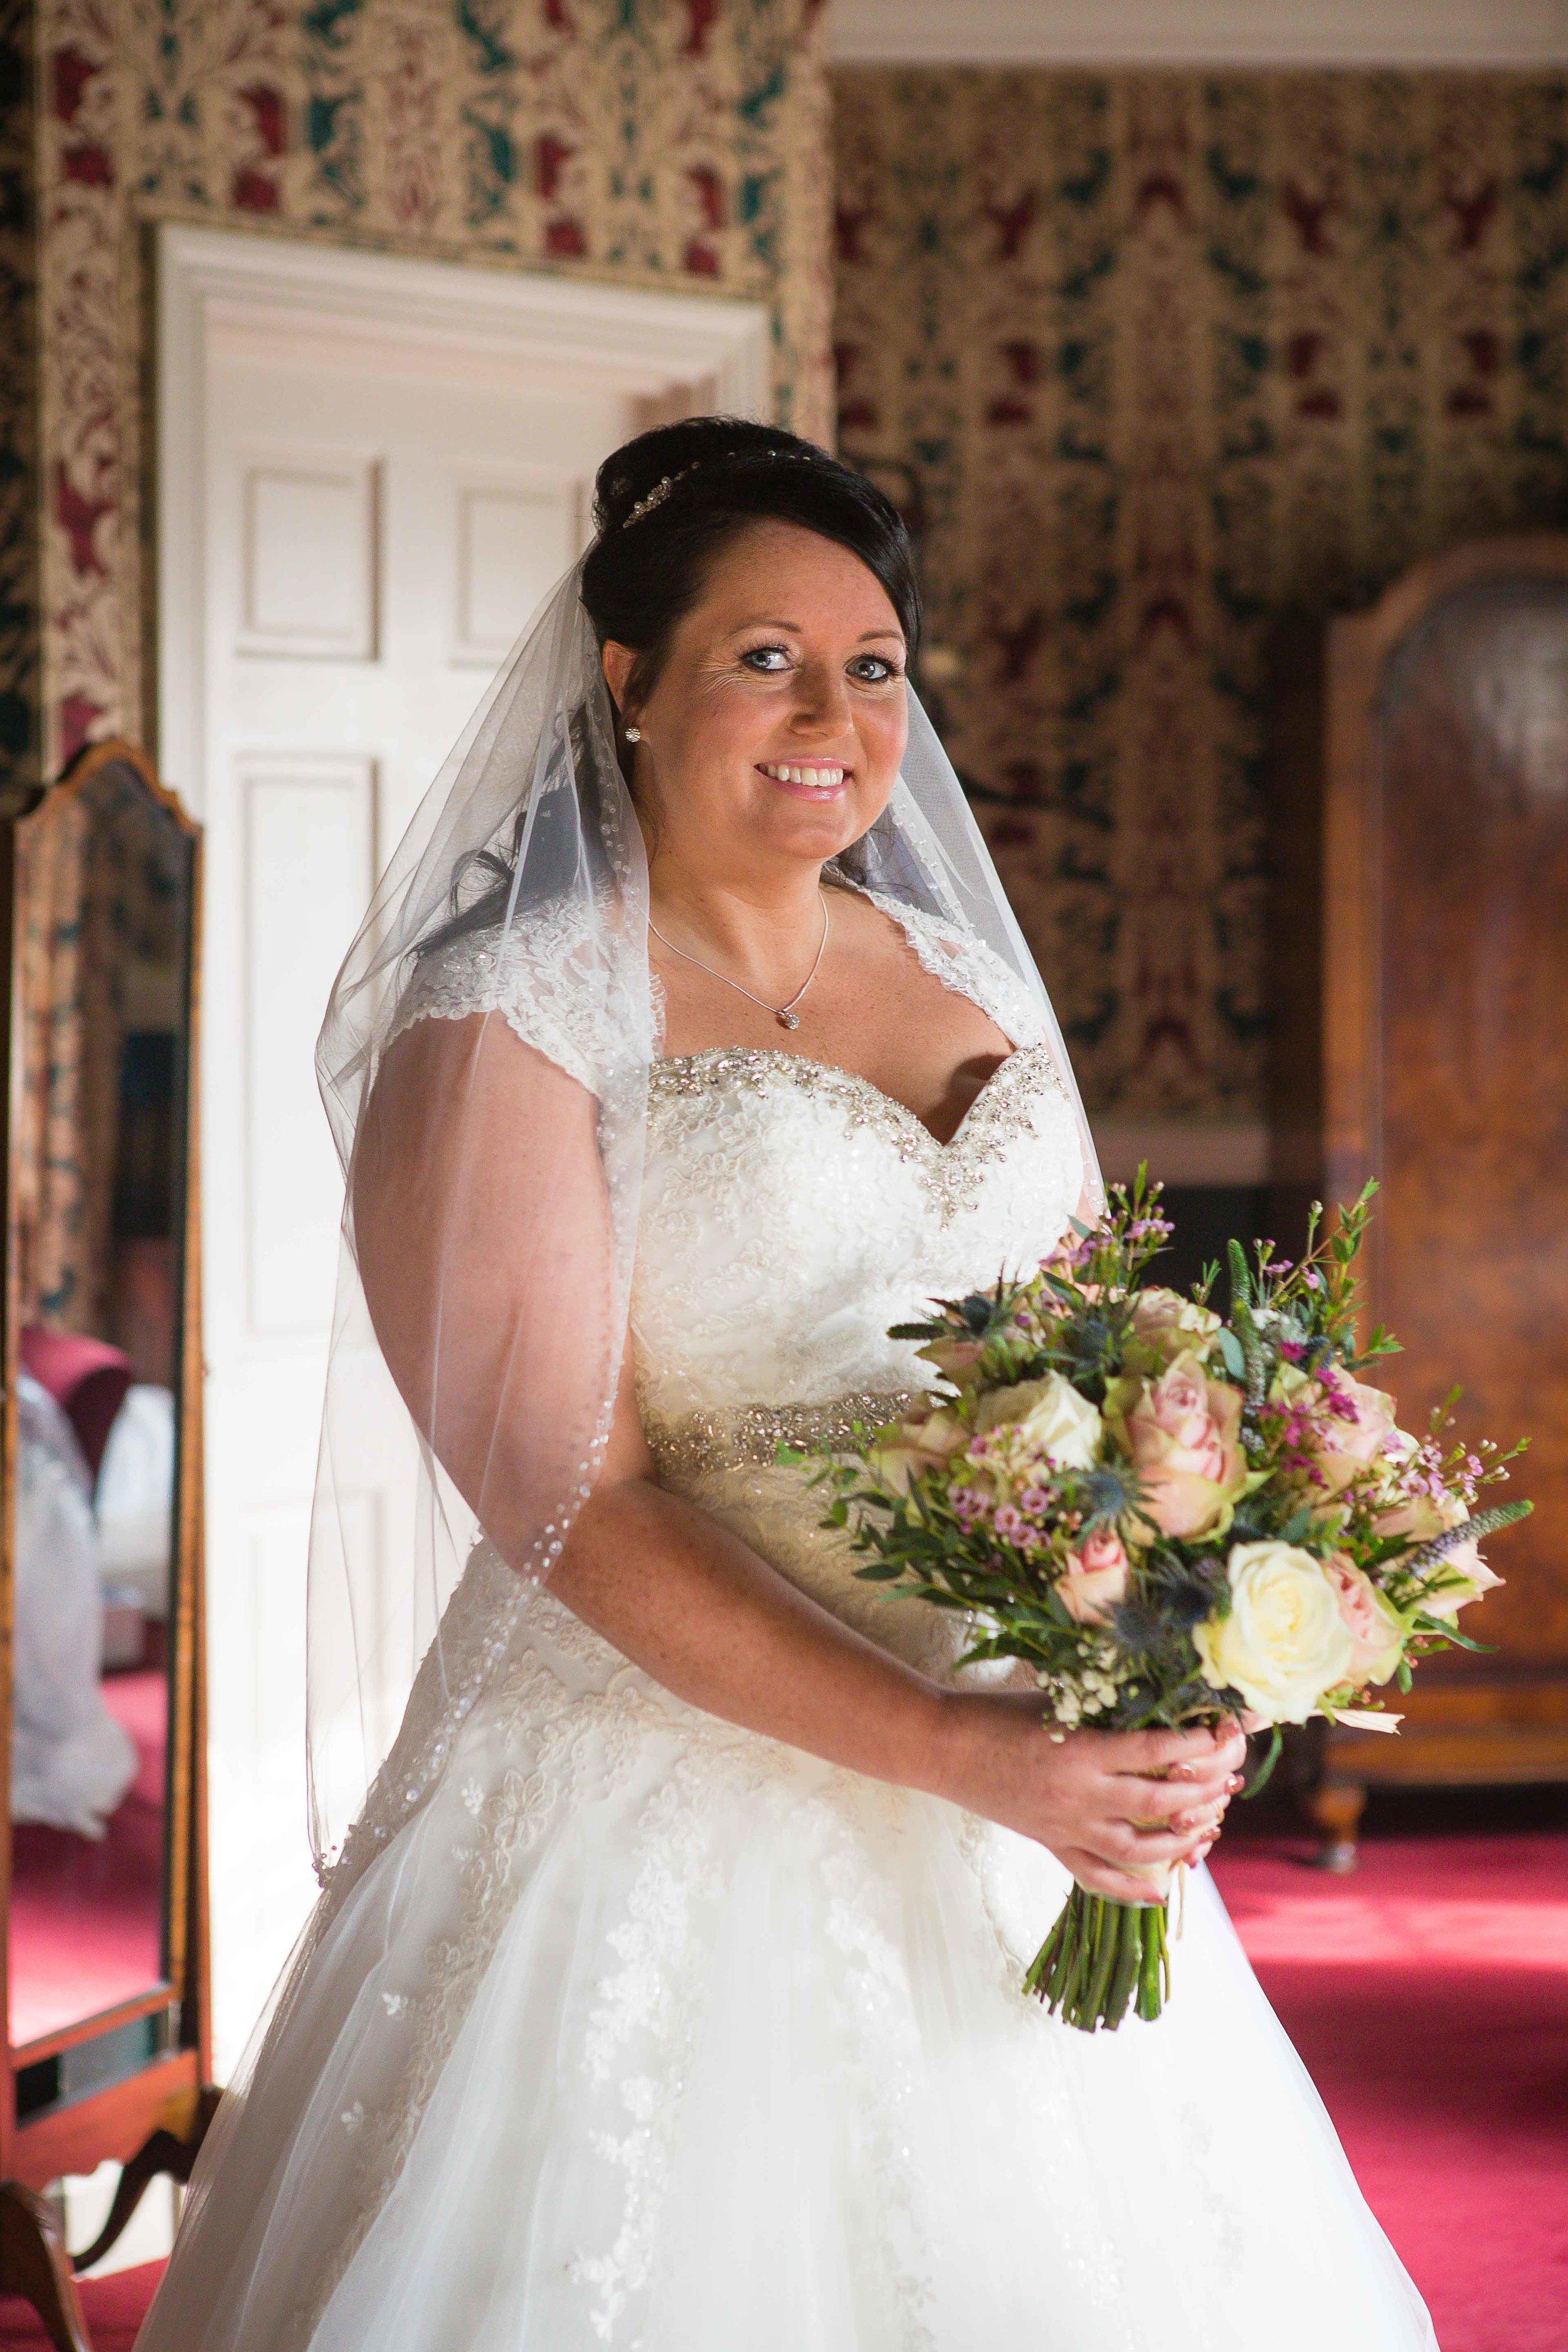 14.02.17 - Matt-Faye-Coombe-Abbey-Valentine-Wedding-Charnwood-Photography-1014.jpg